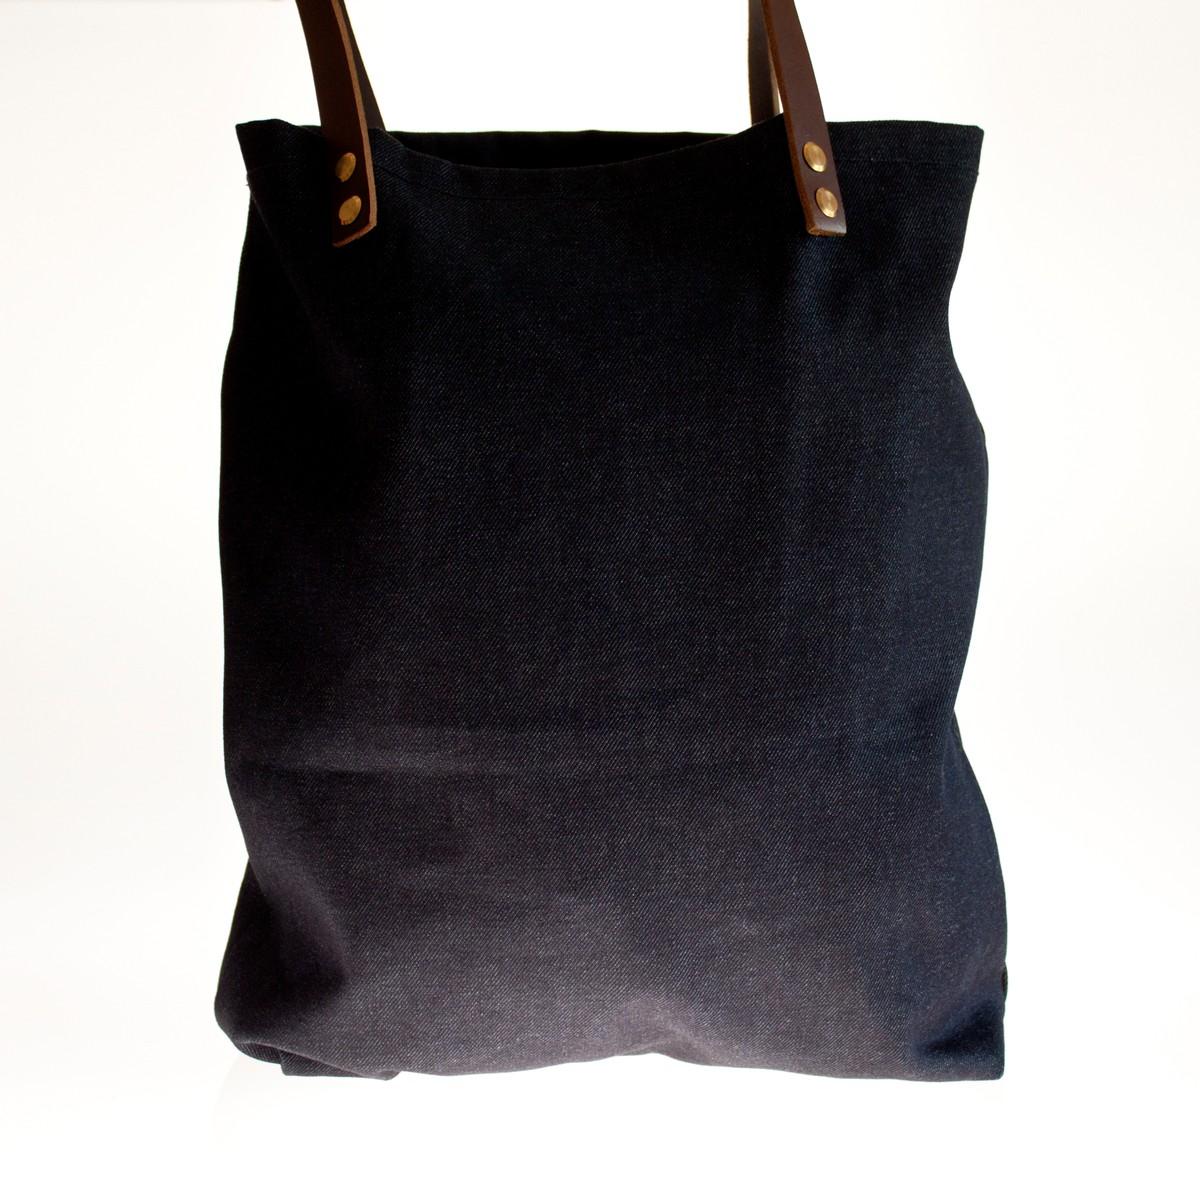 Photo of Indigo Denim Tote Bag